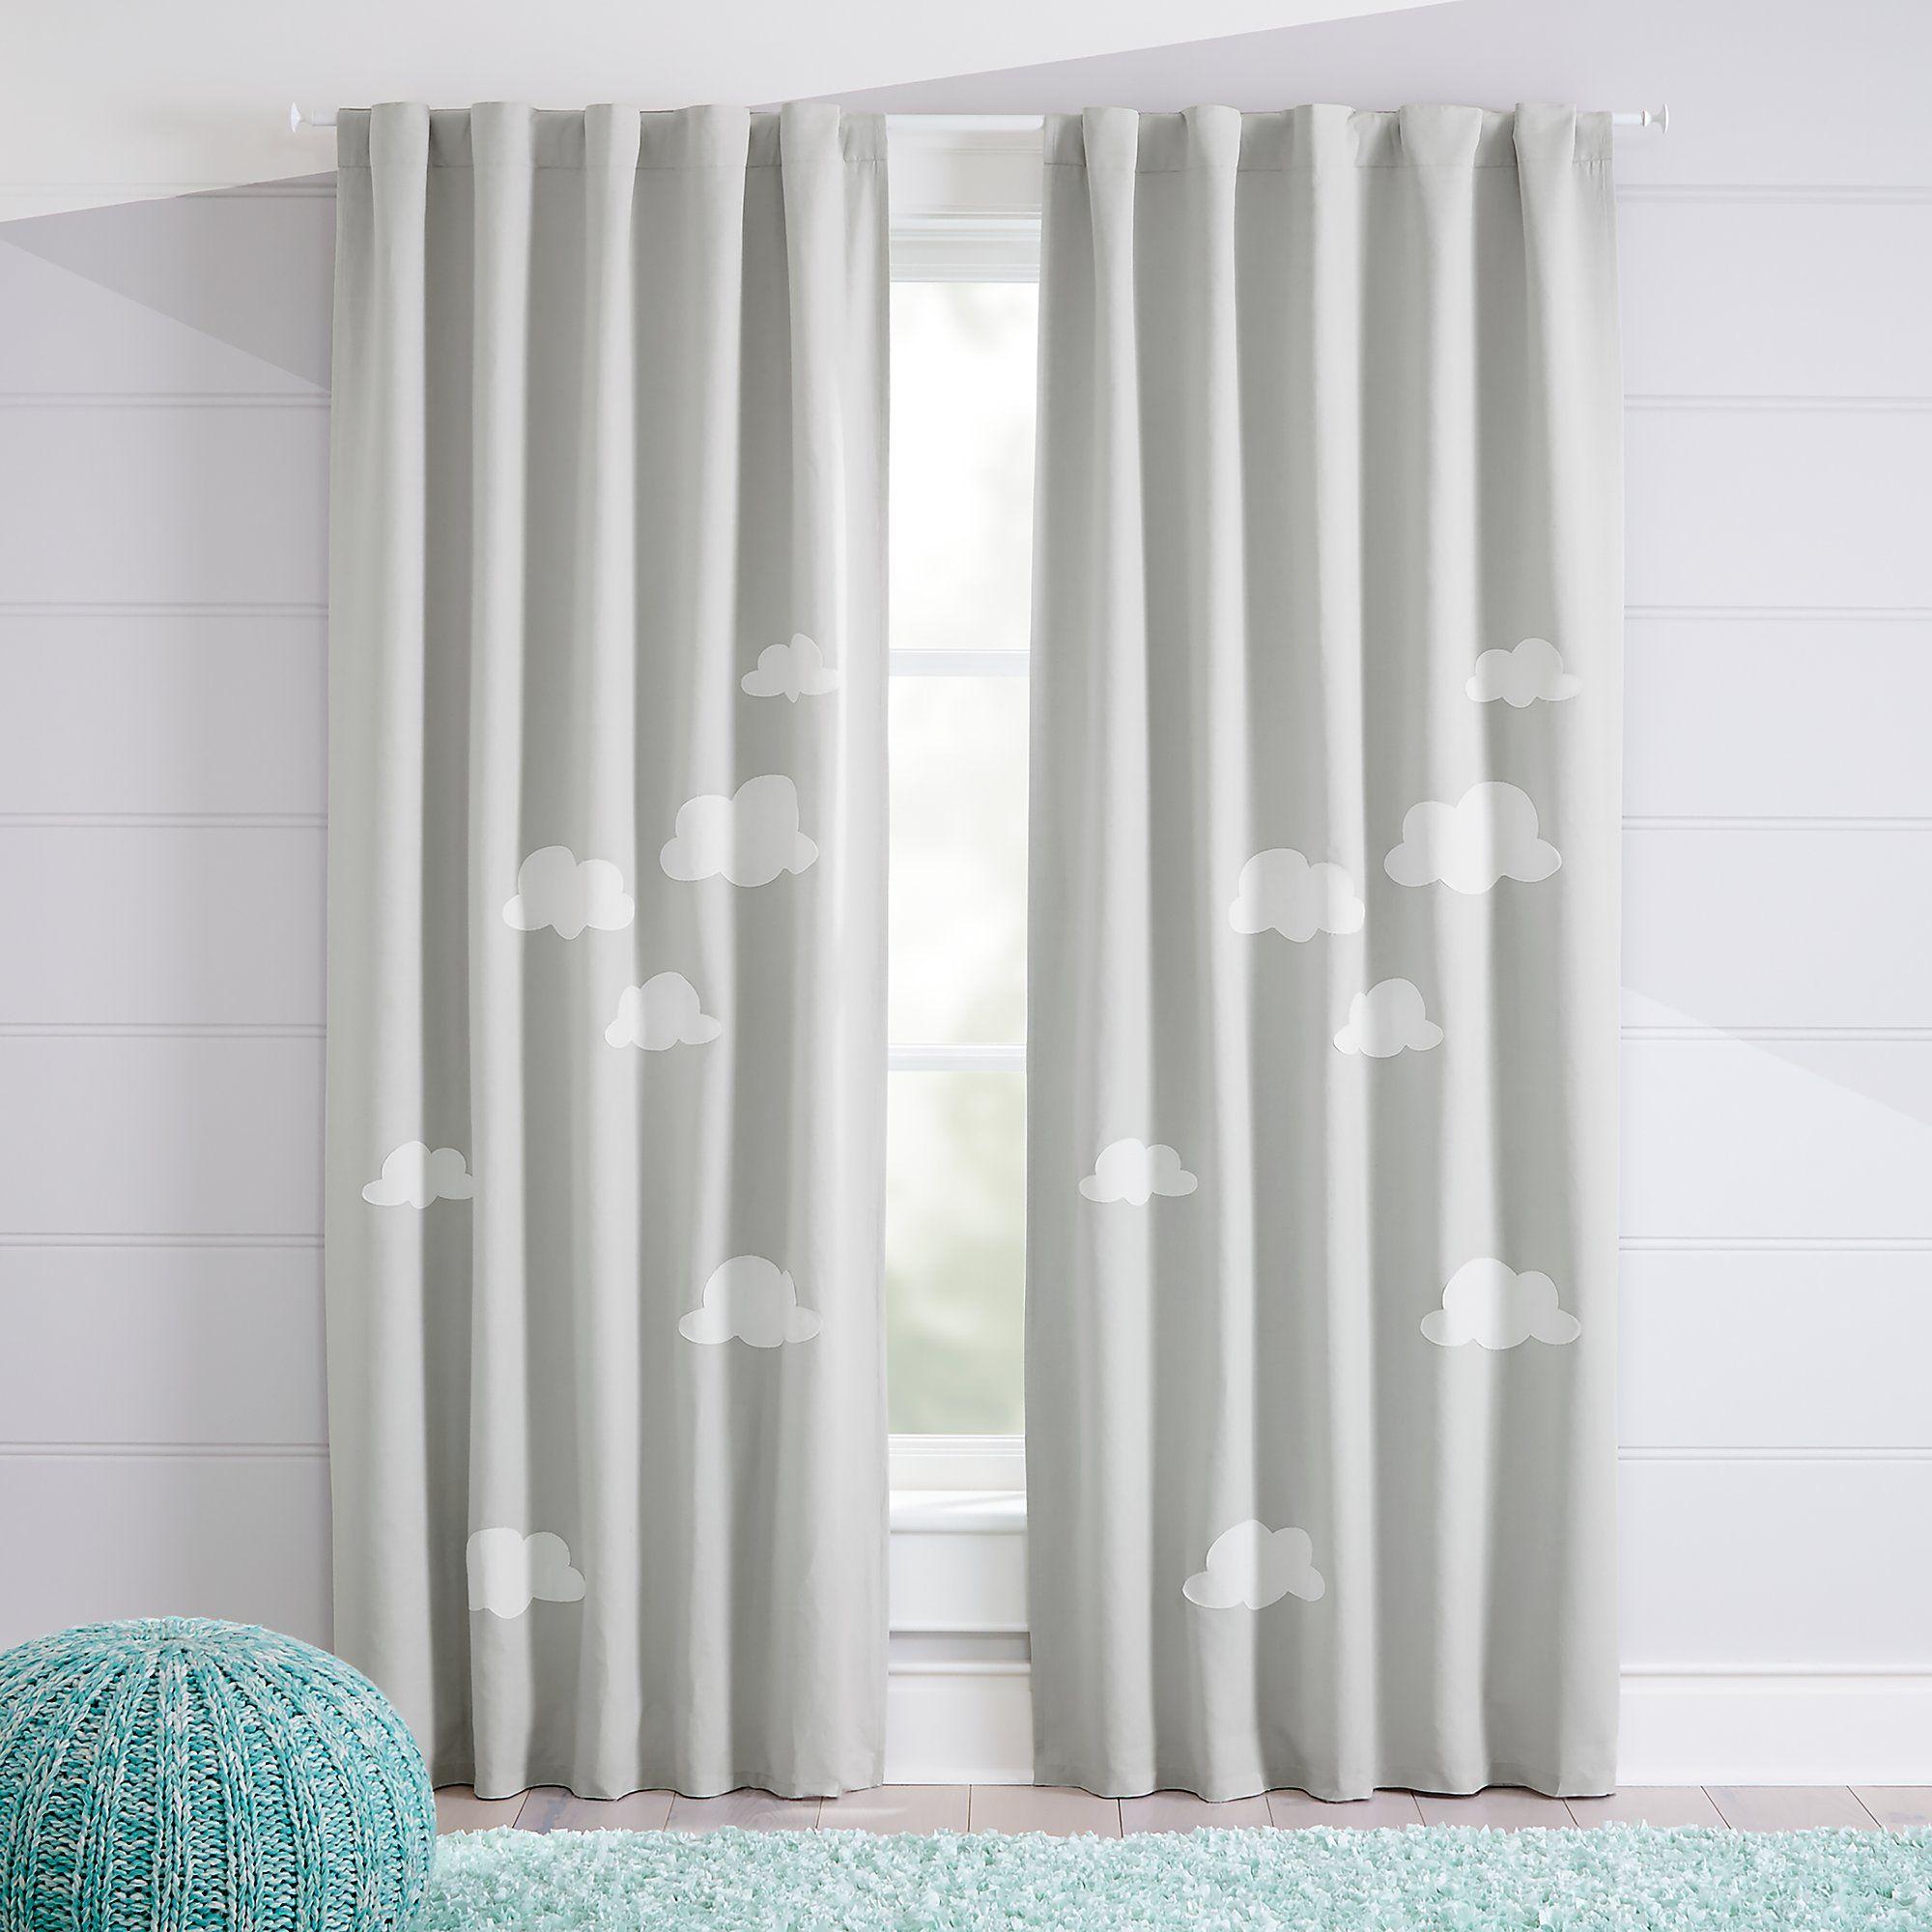 of pin the curtain nod cloud nursery land pinterest blackout curtains